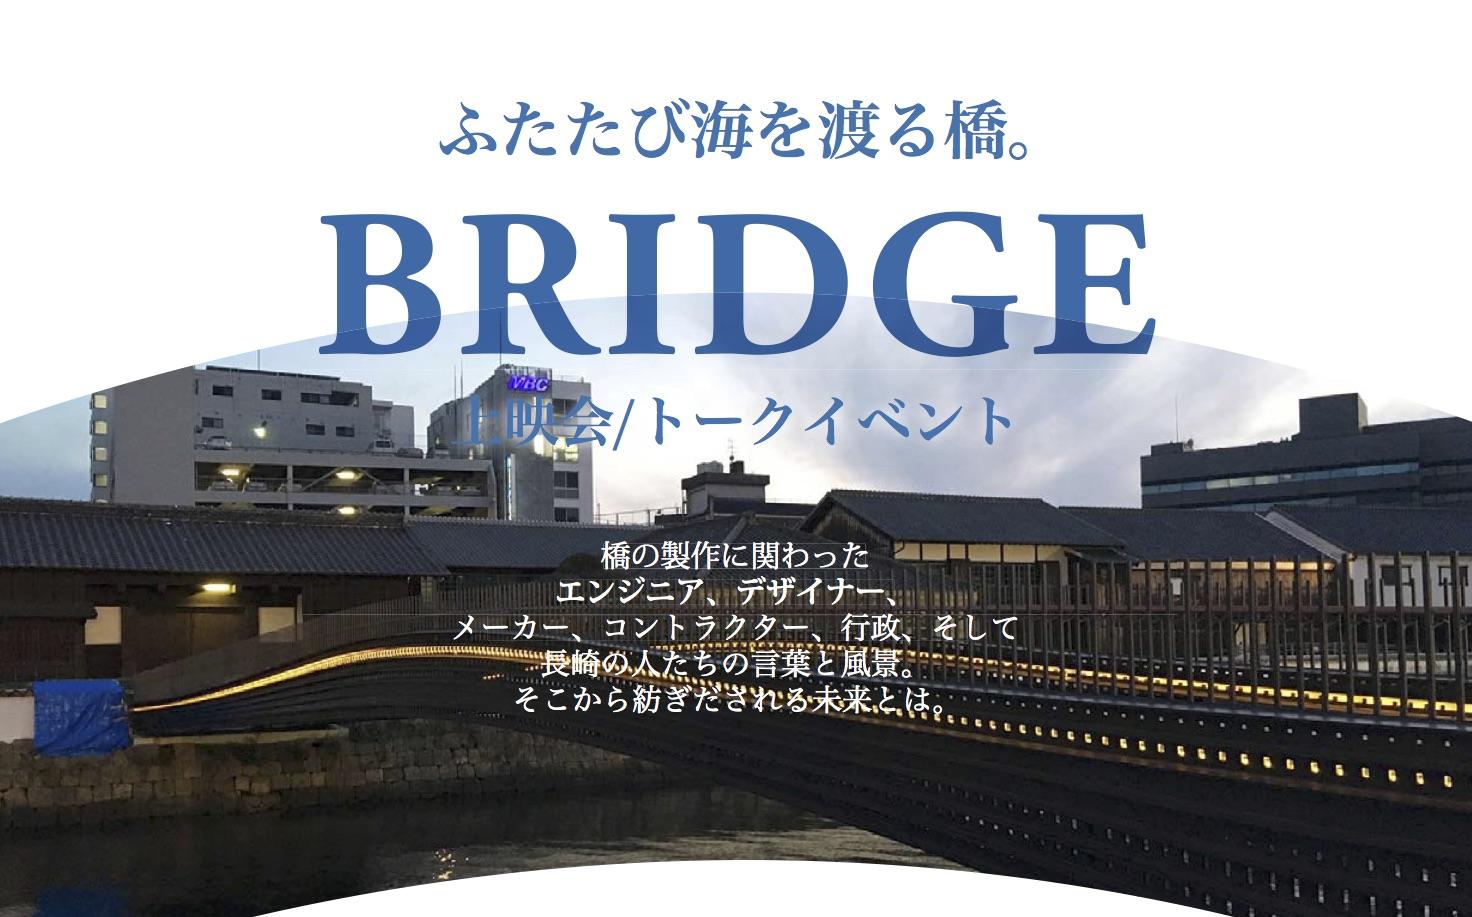 181212_BRIDGE_flyer